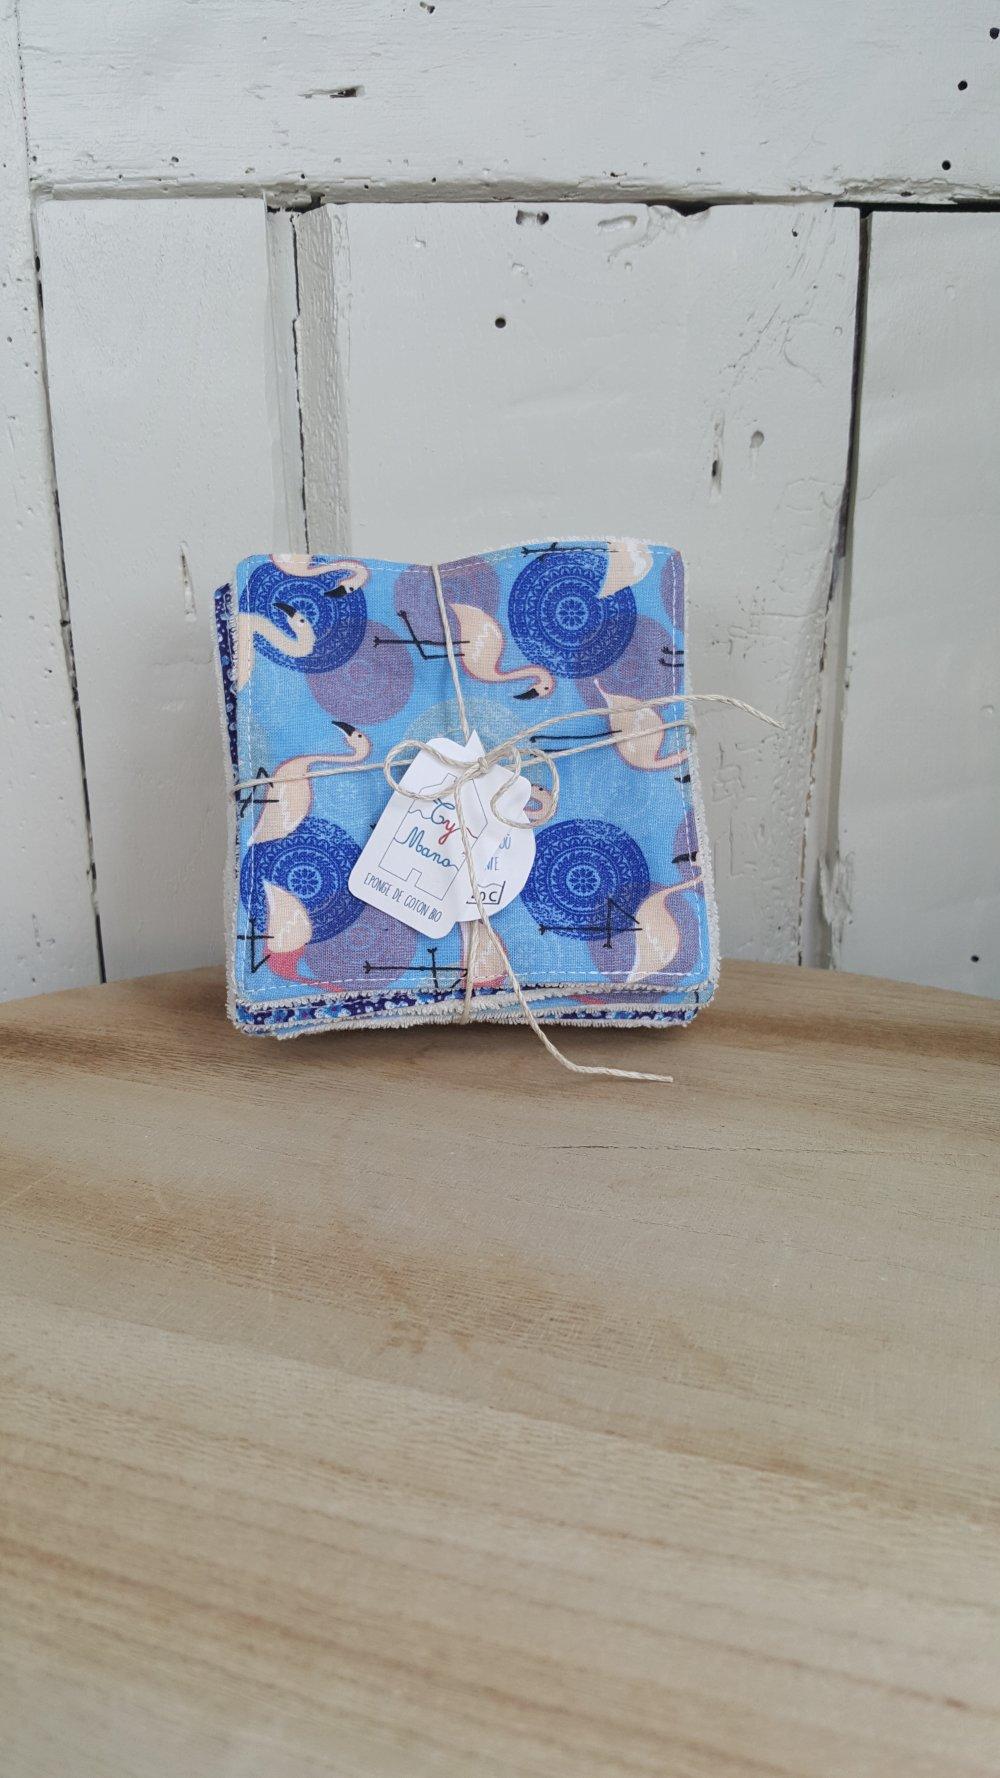 Lot de 10 lingettes bio, tons bleu & rose 10x10 cm